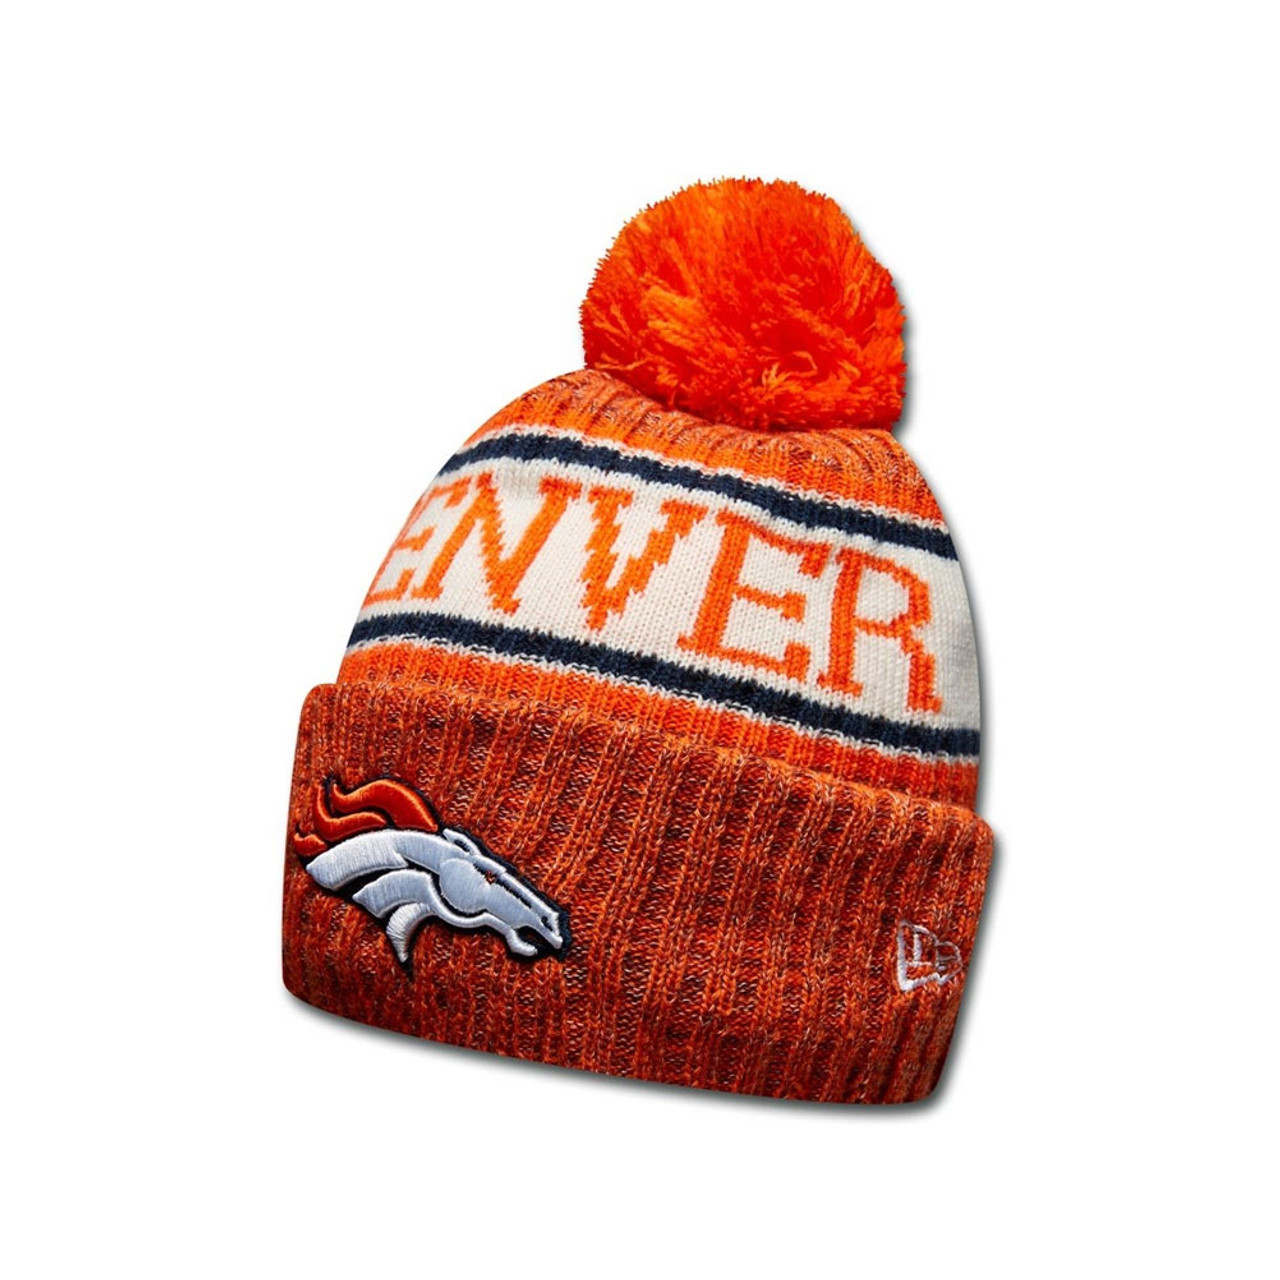 b761de18e9c EW ERA Denver Broncos NFL sideline knit bobble beanie hat  orange